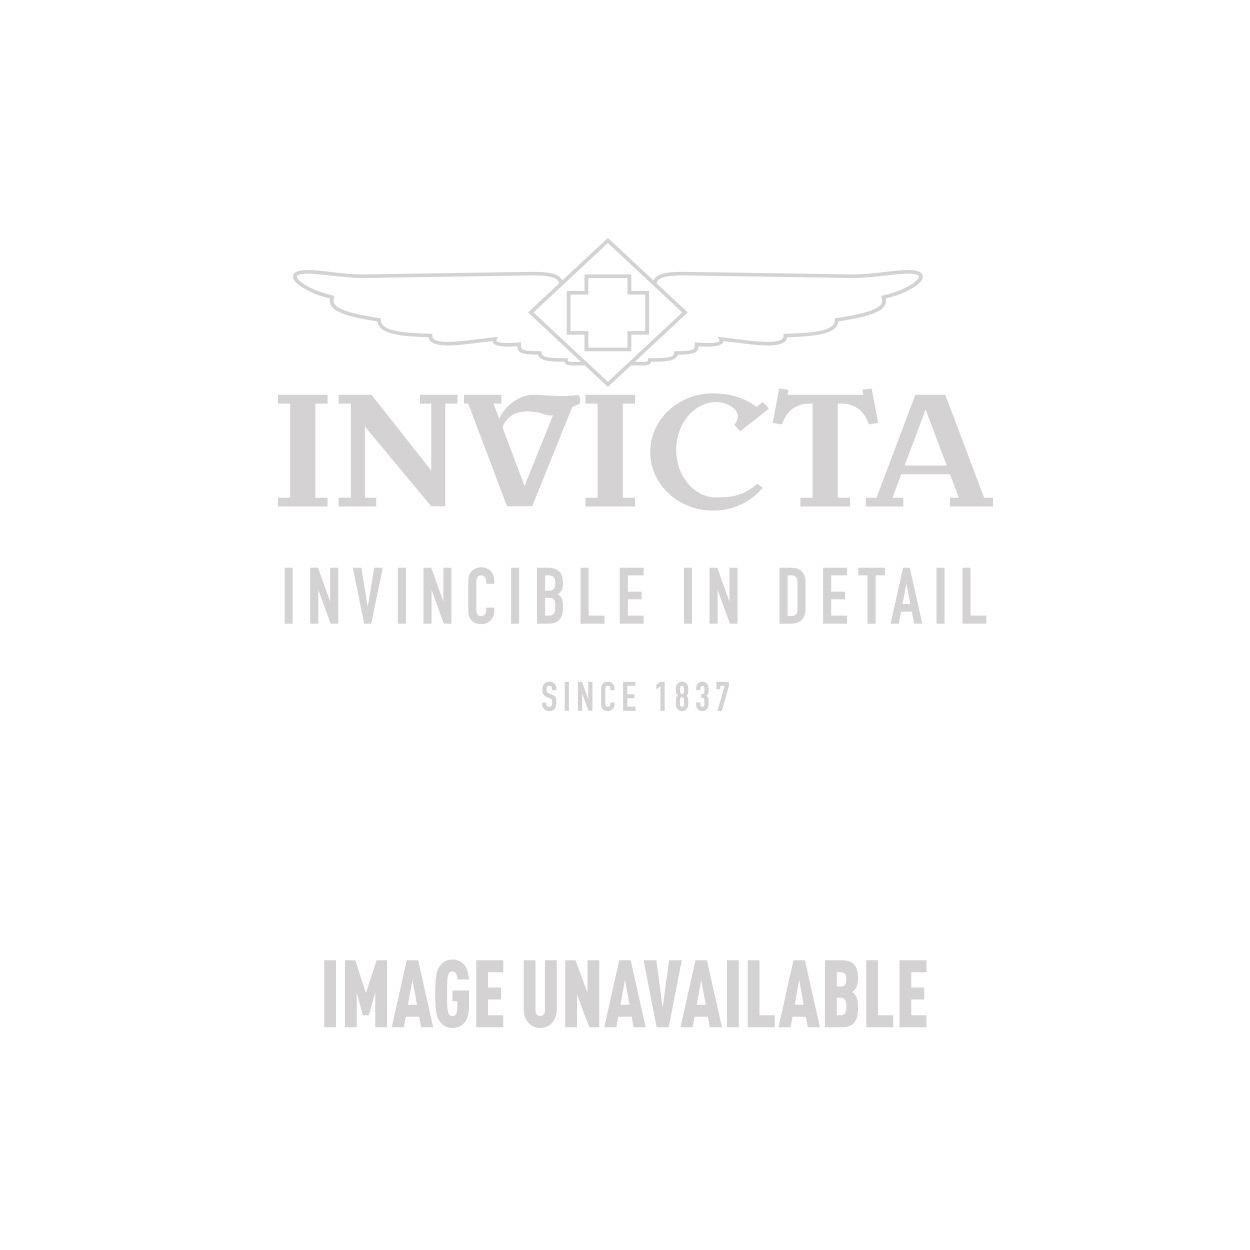 Invicta Subaqua Swiss Made Quartz Watch - Black case with Black tone Polyurethane band - Model 0912